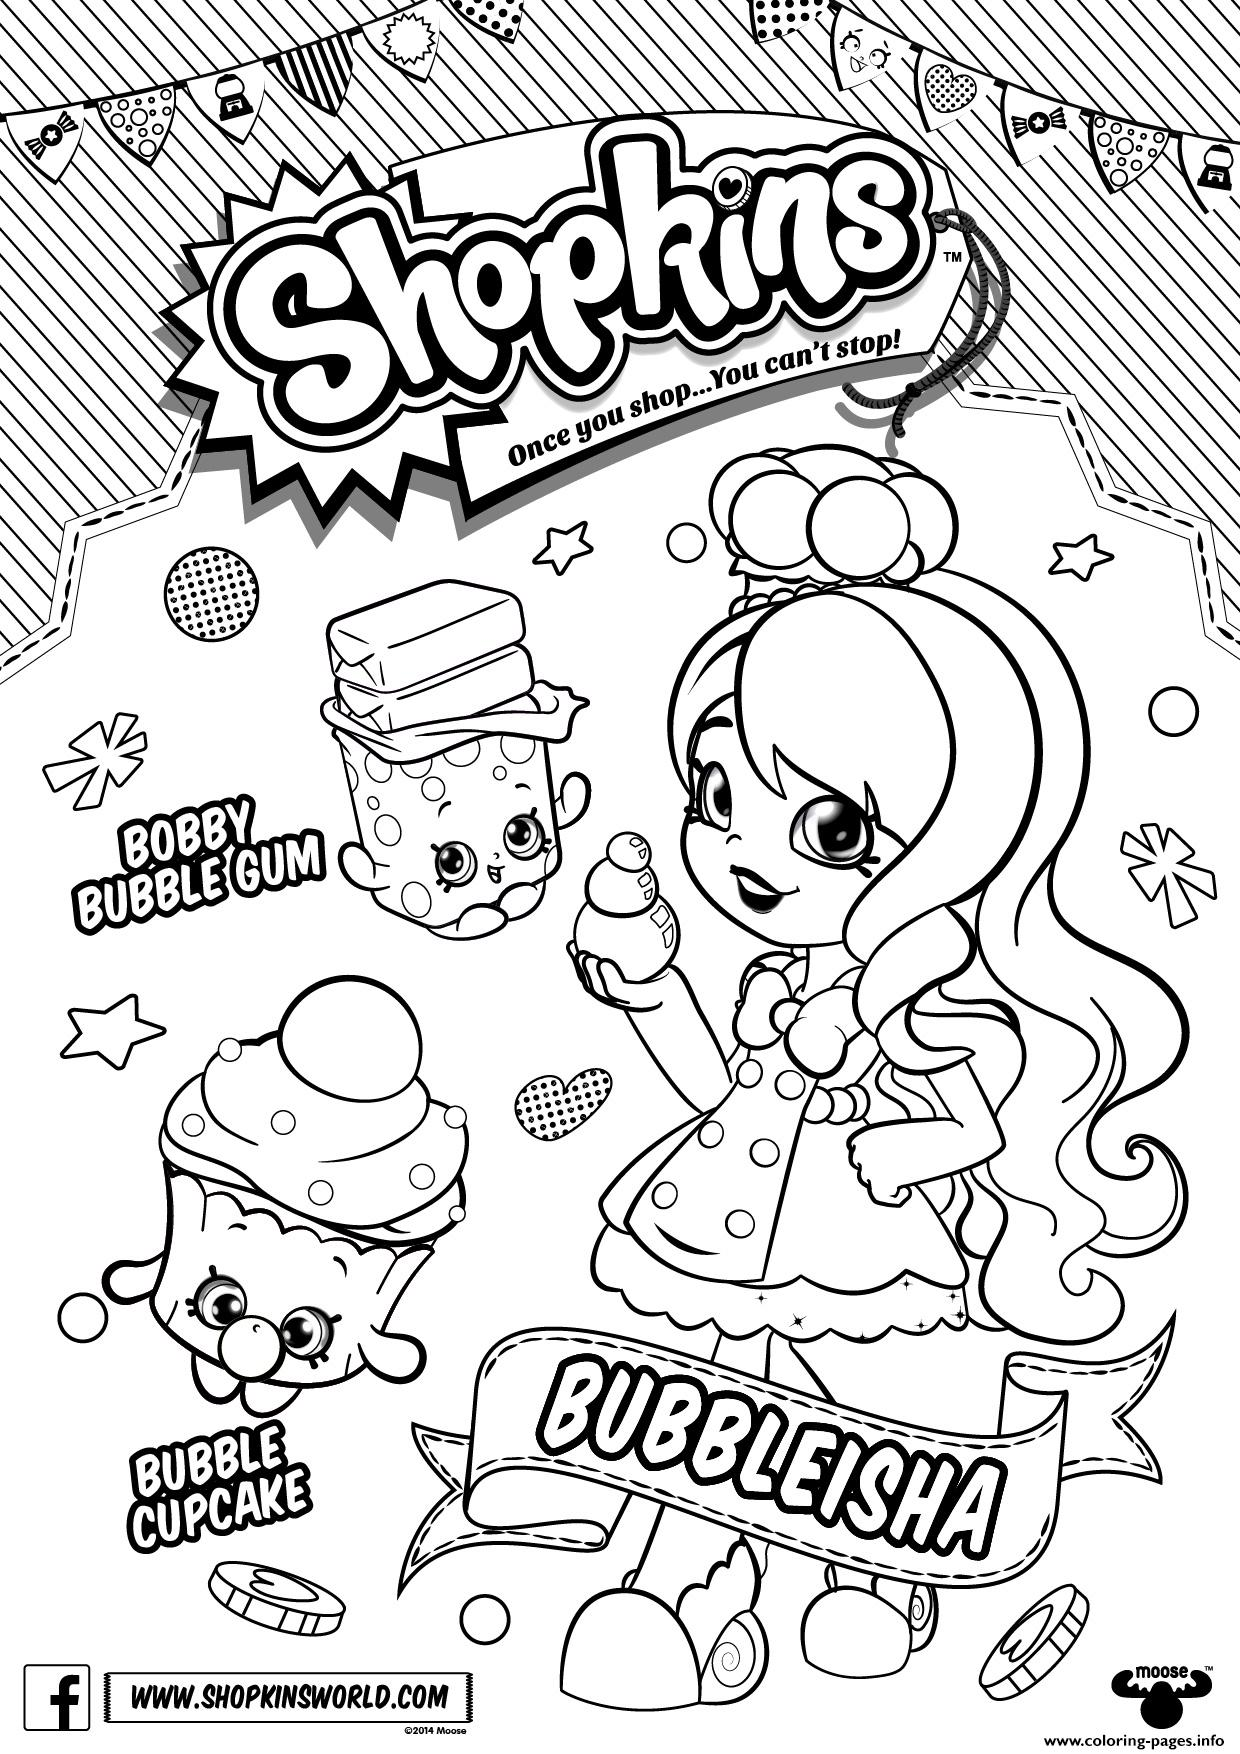 Bubbleisha Shopkins Shoppies With Bubble Gum Coloring Pages Printable